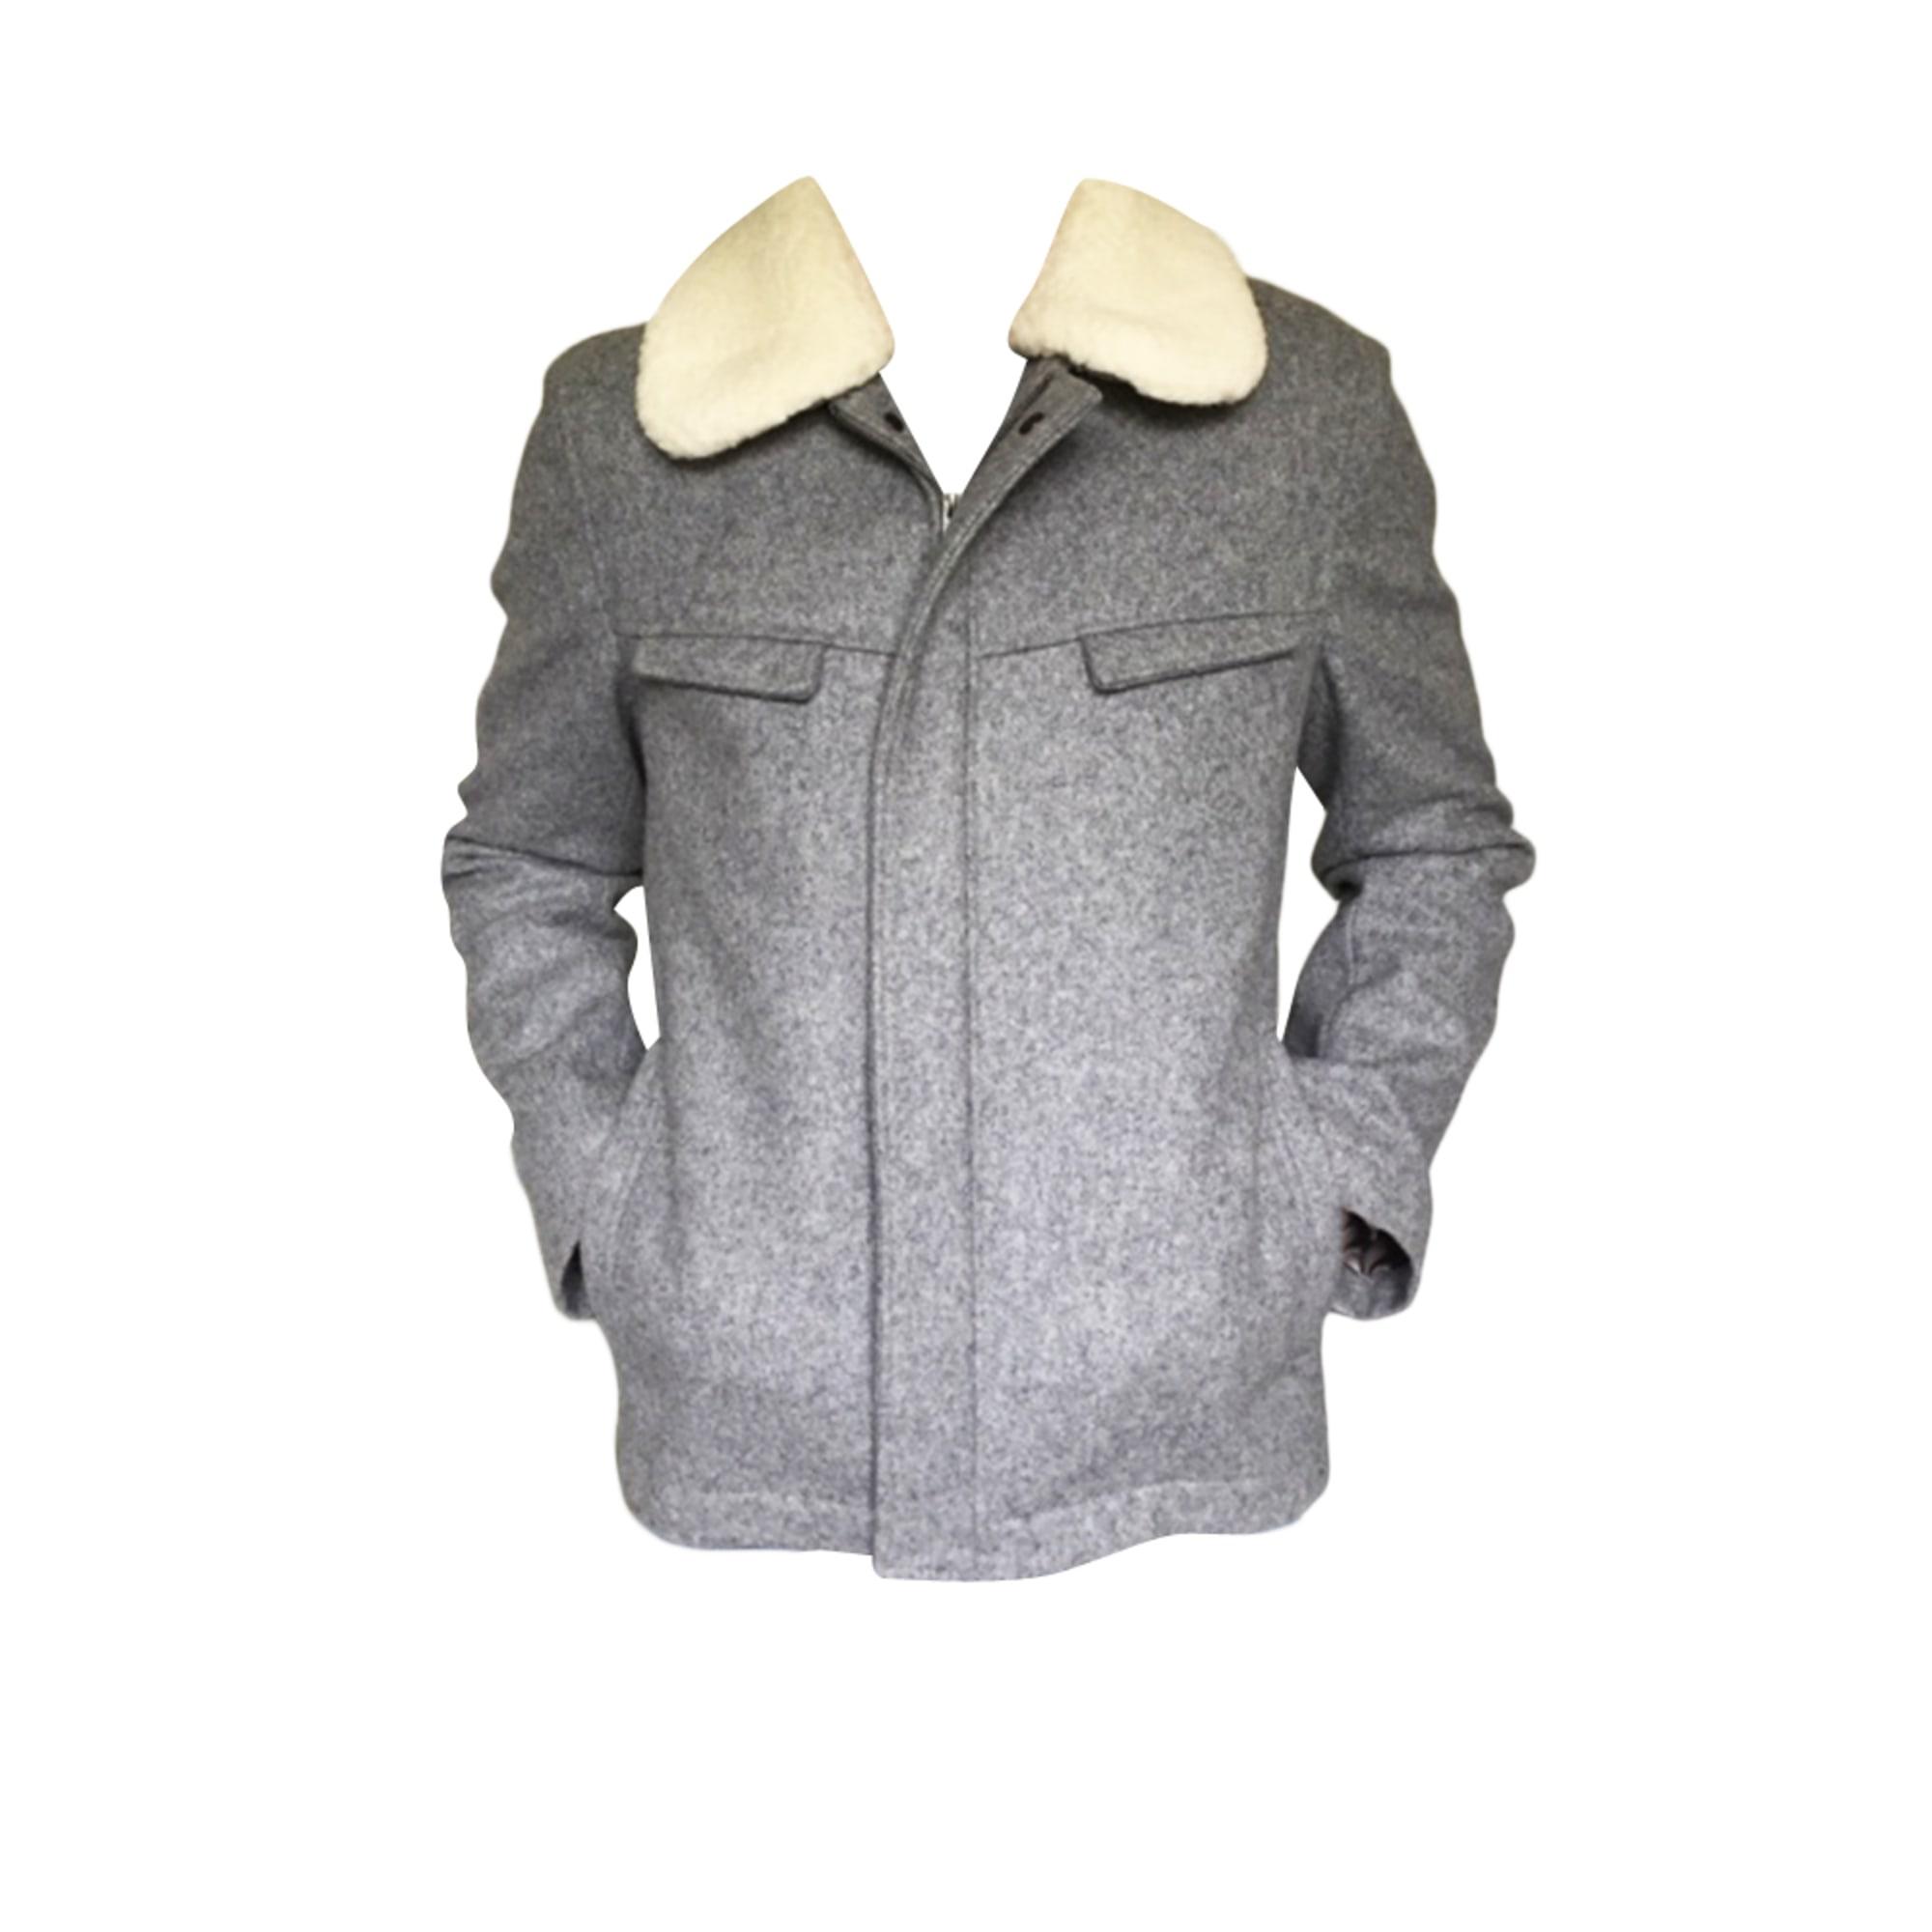 Zipped Jacket BONNE GUEULE Gray, charcoal